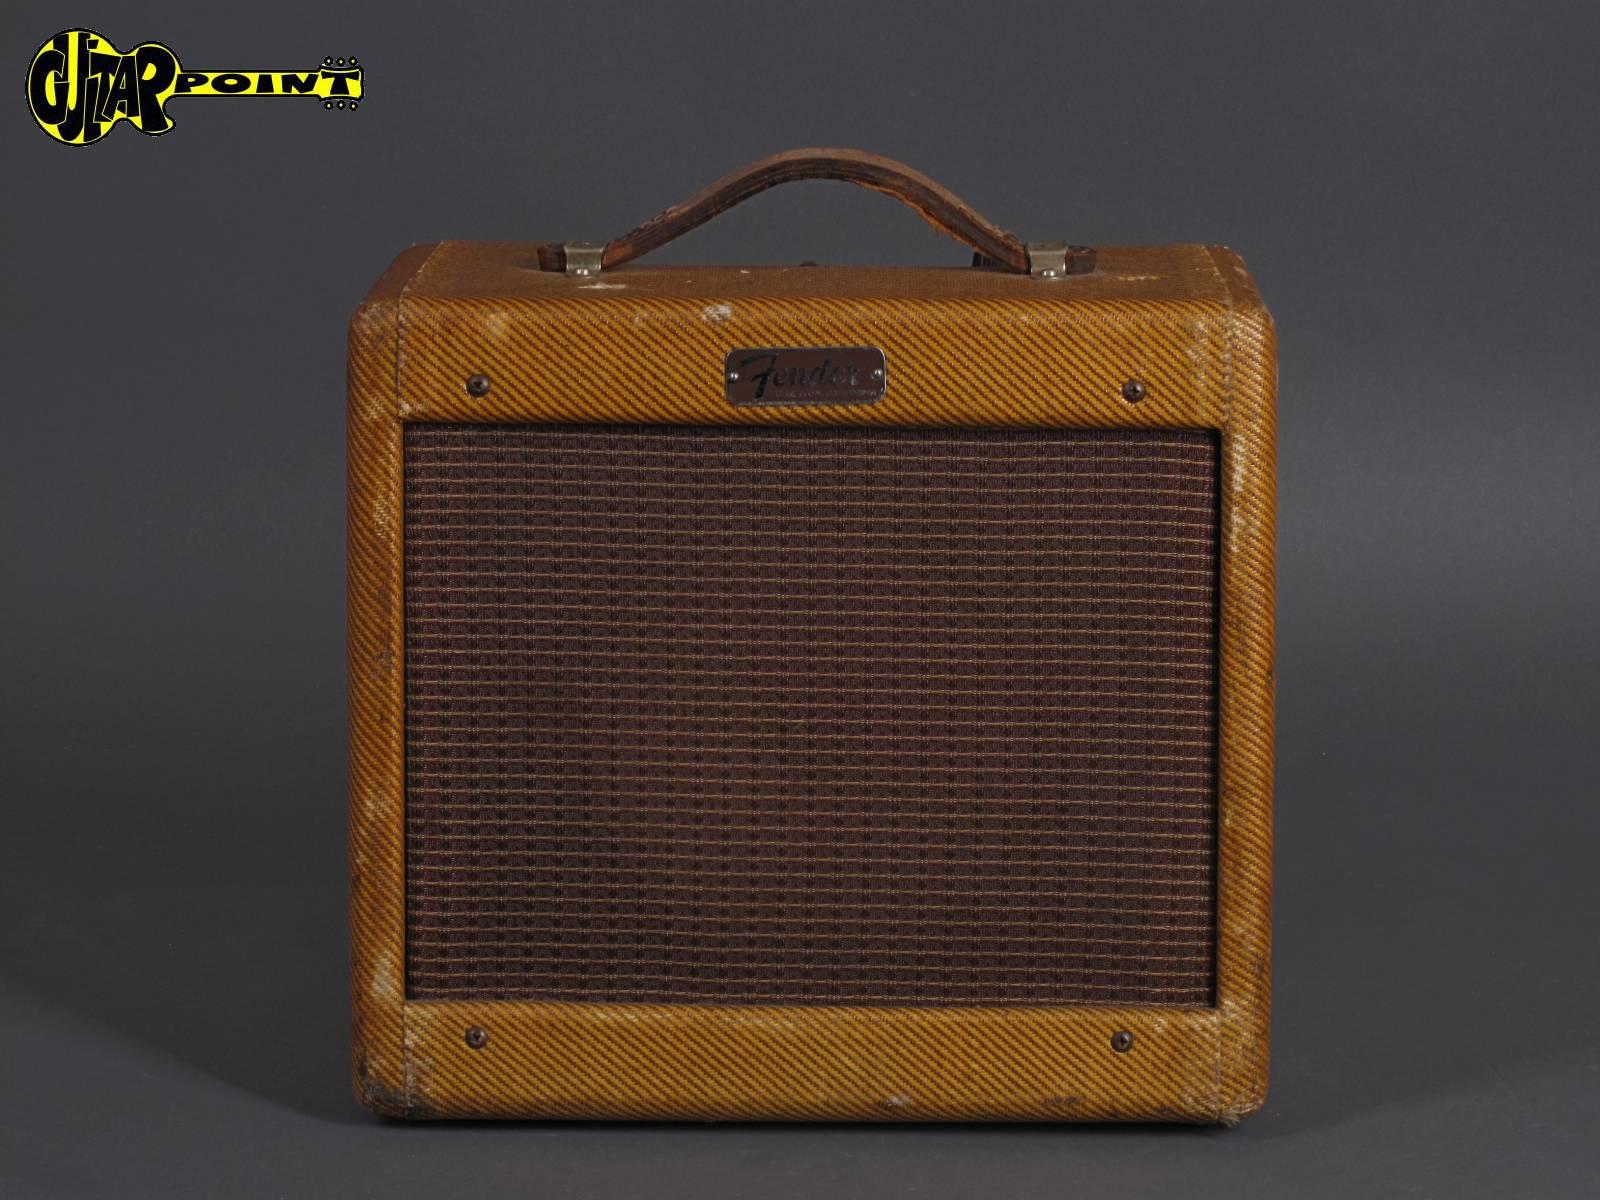 1959 Fender Champ  Tweed Amp